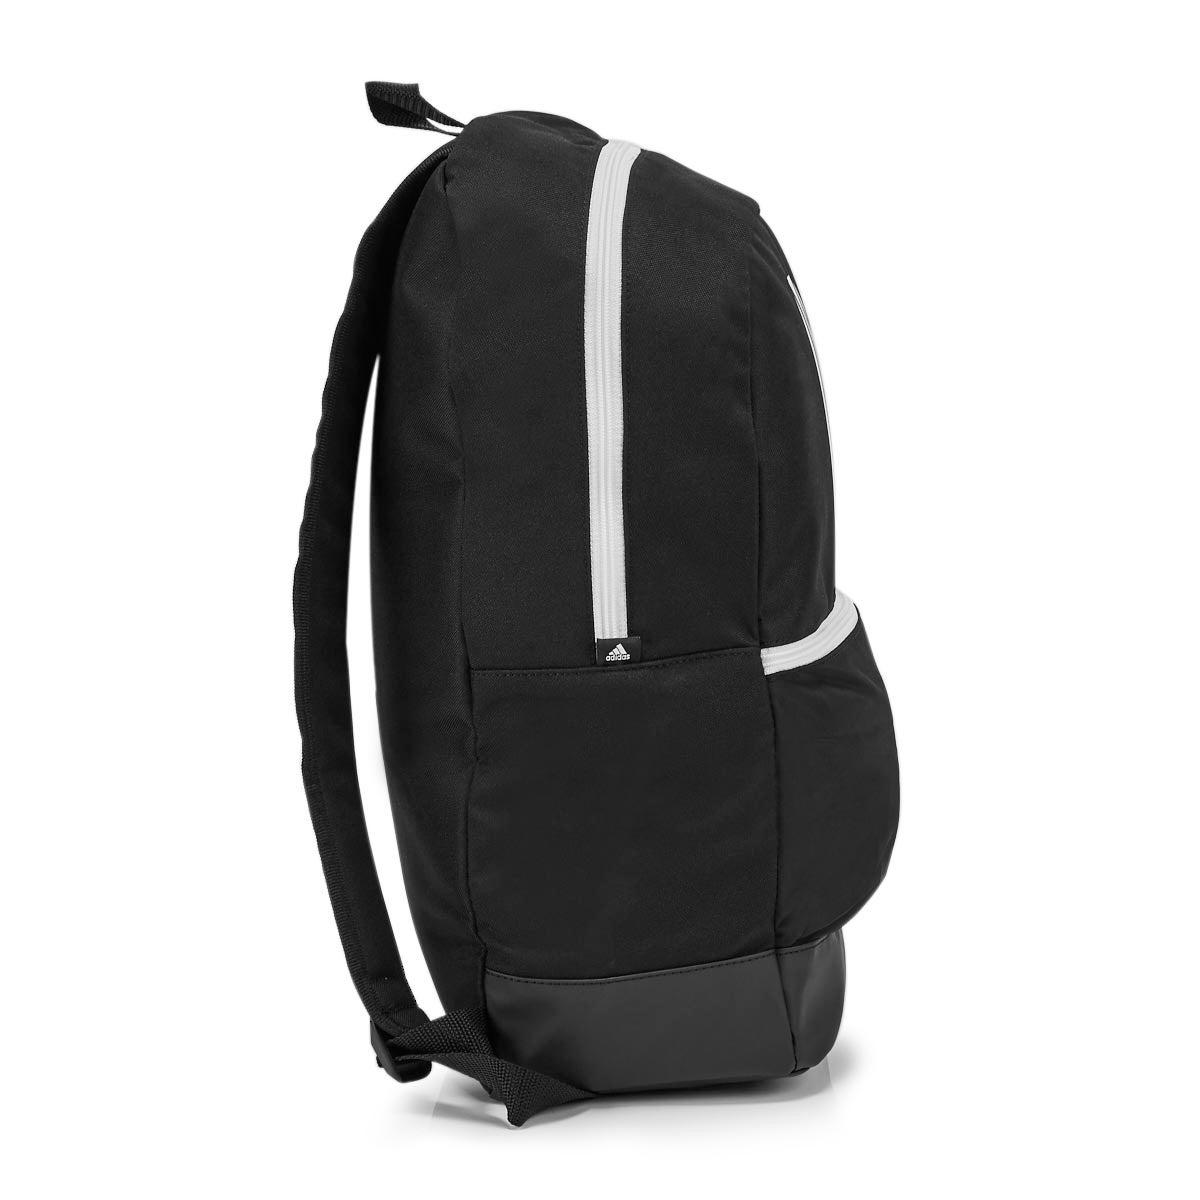 Adidas Clas BP 3S blk/blk backpack